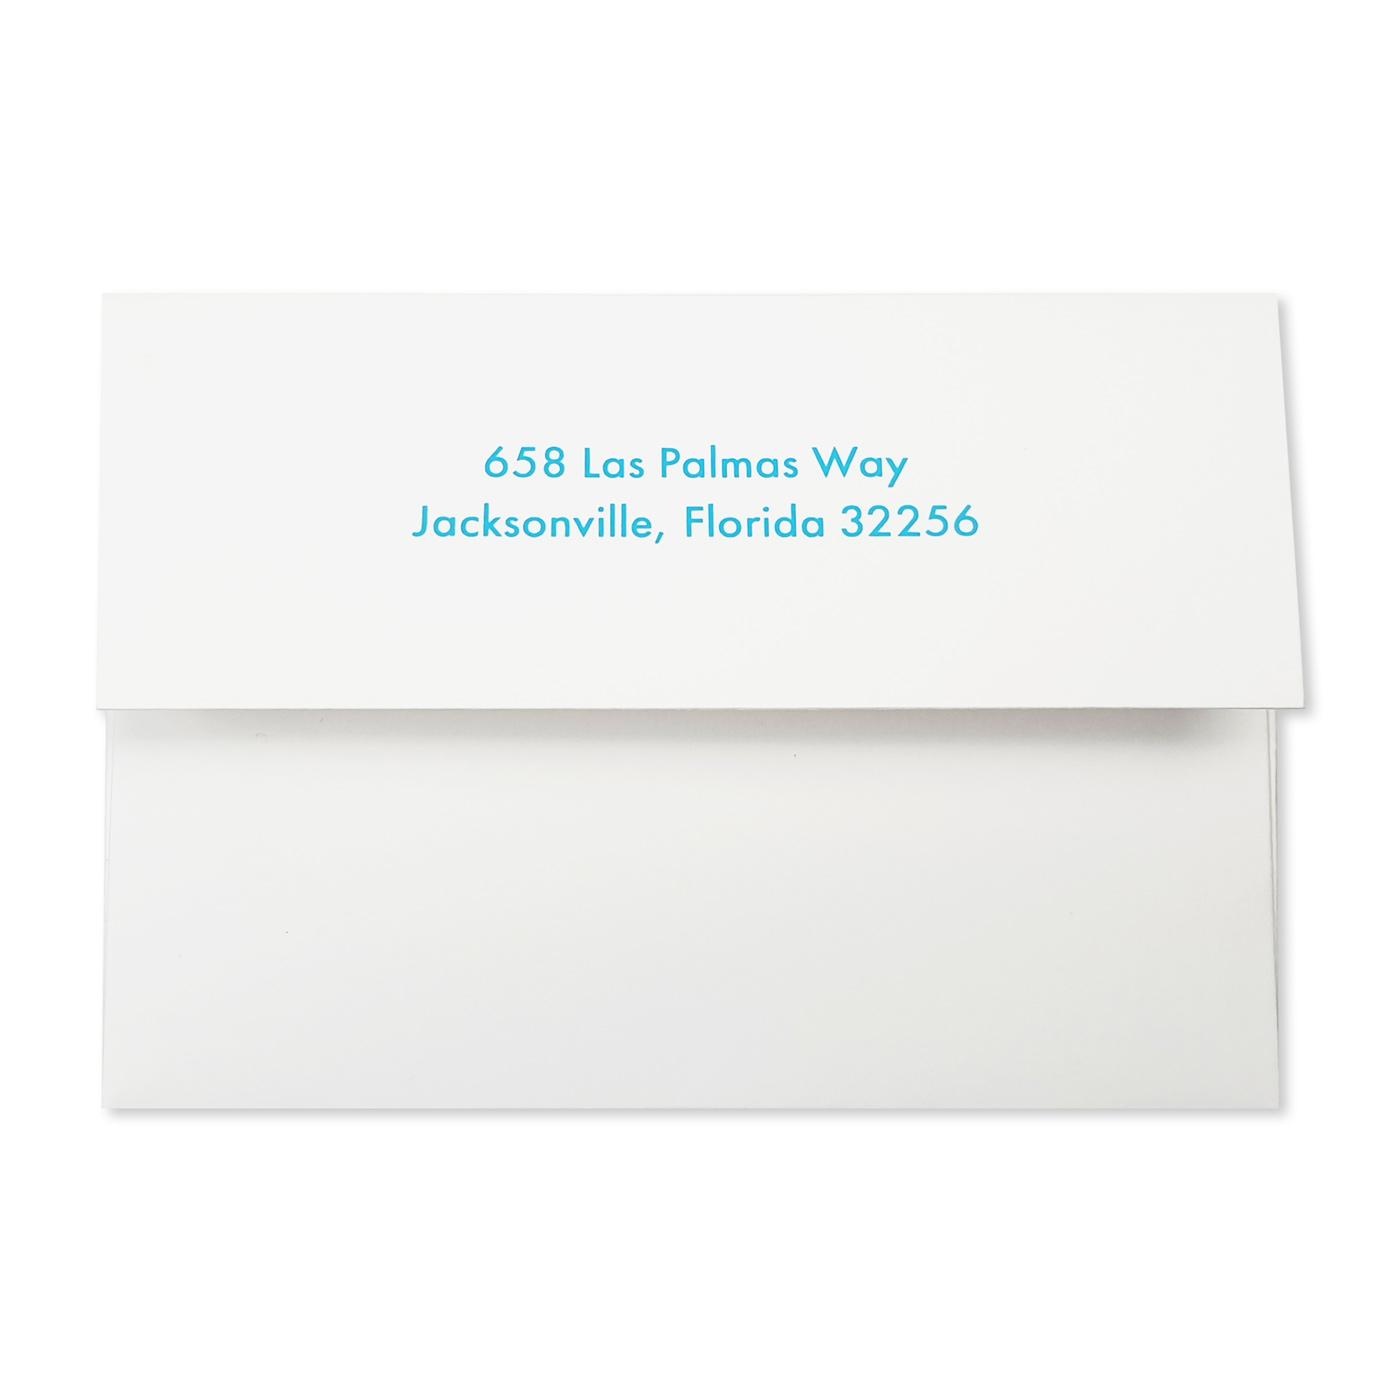 Thank You Cards : TYC-GET_THE_PASSPORT - 123WeddingCards